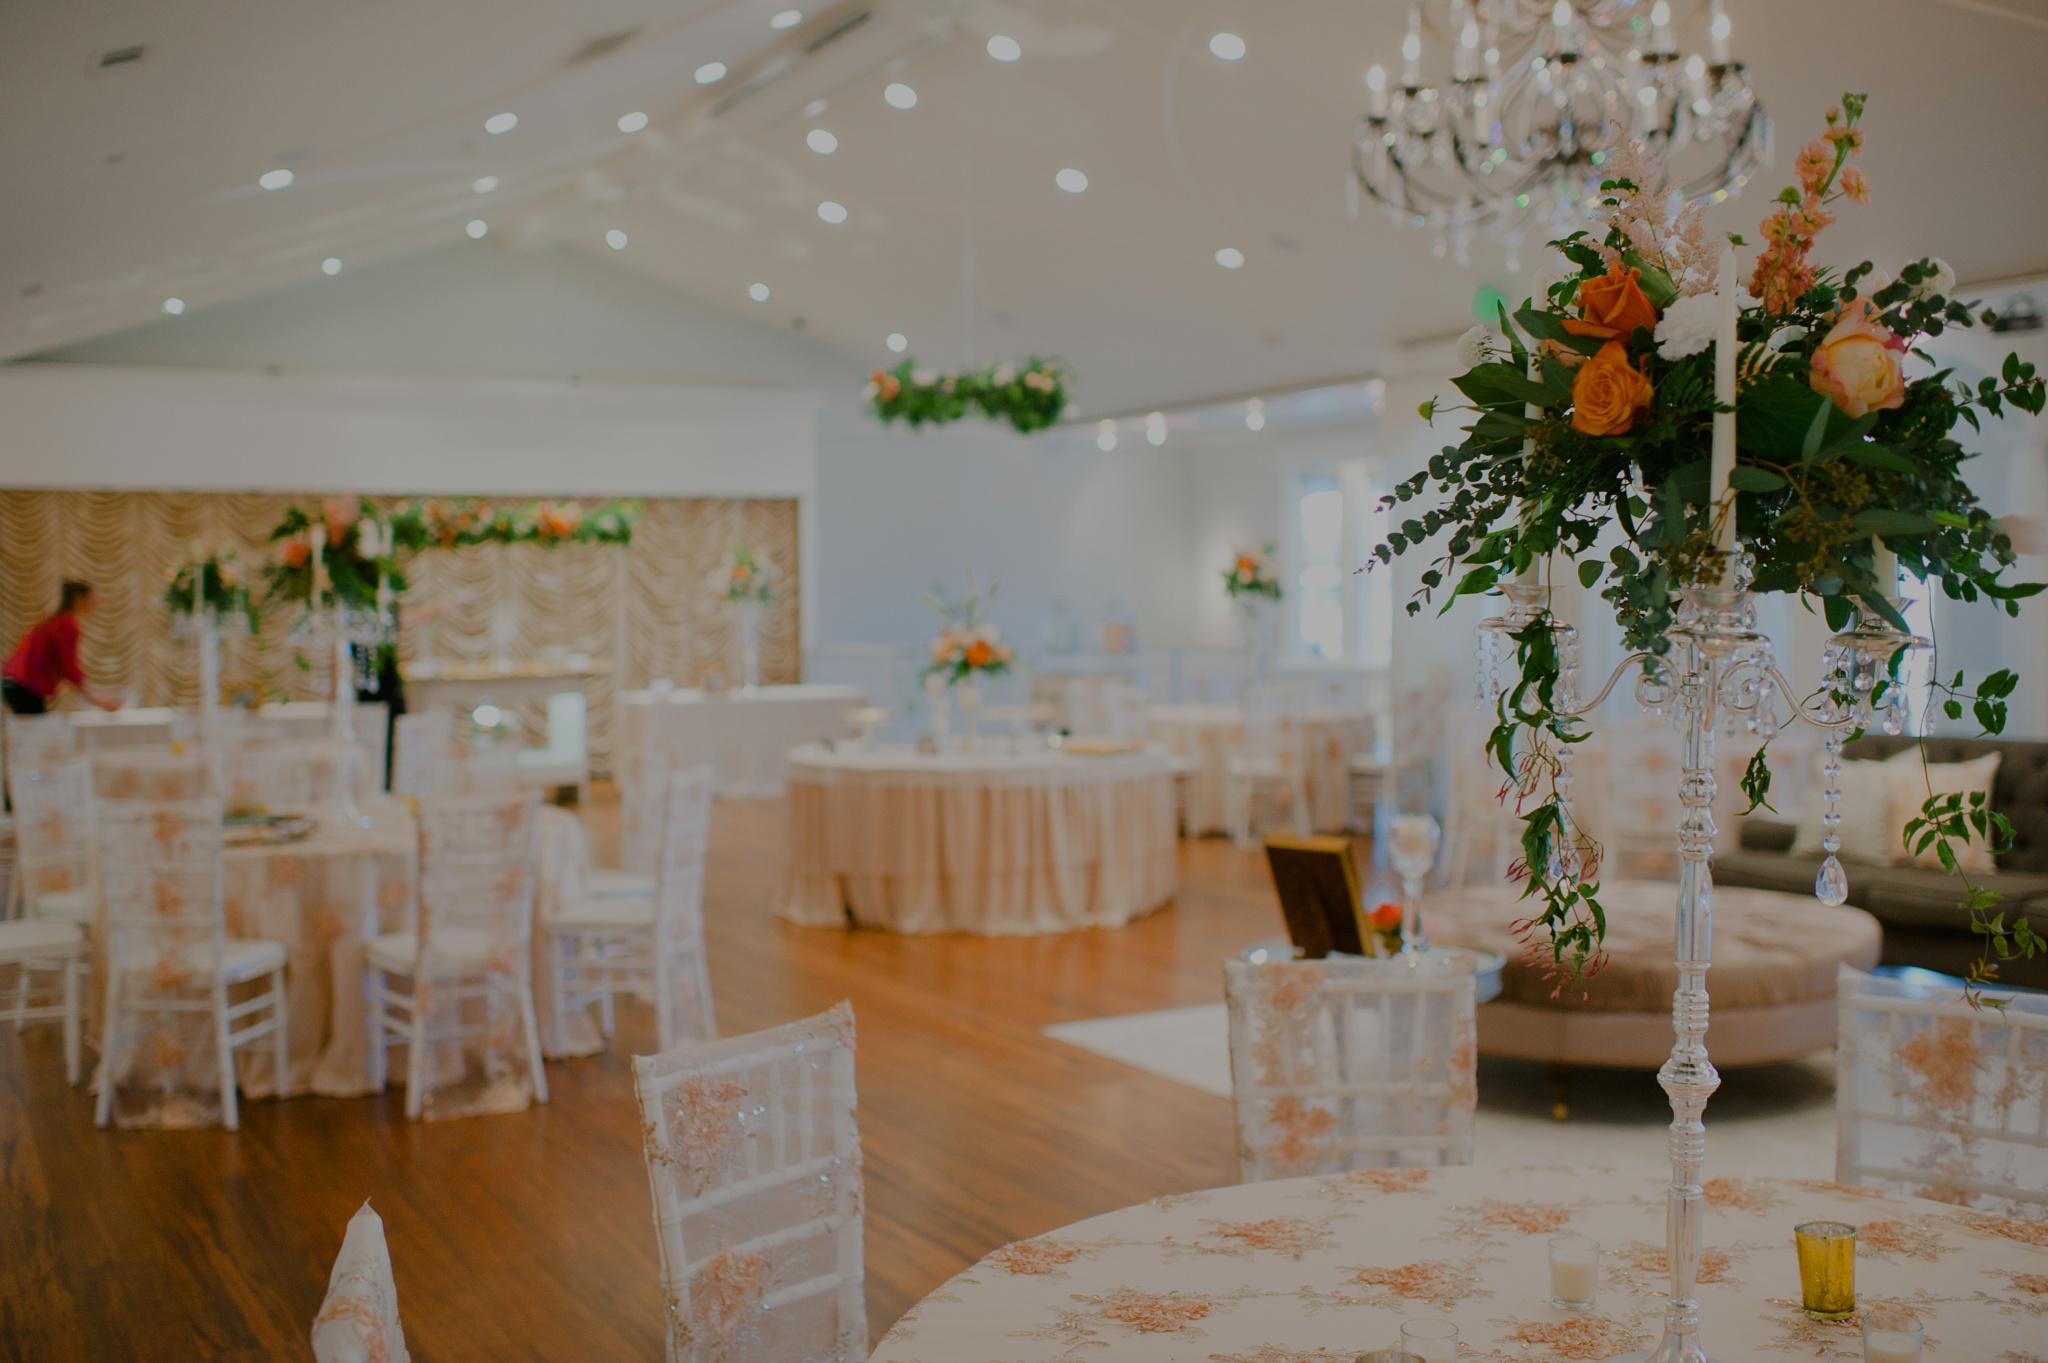 Wedding Events Castle Park Weddings Events Venue Utah County